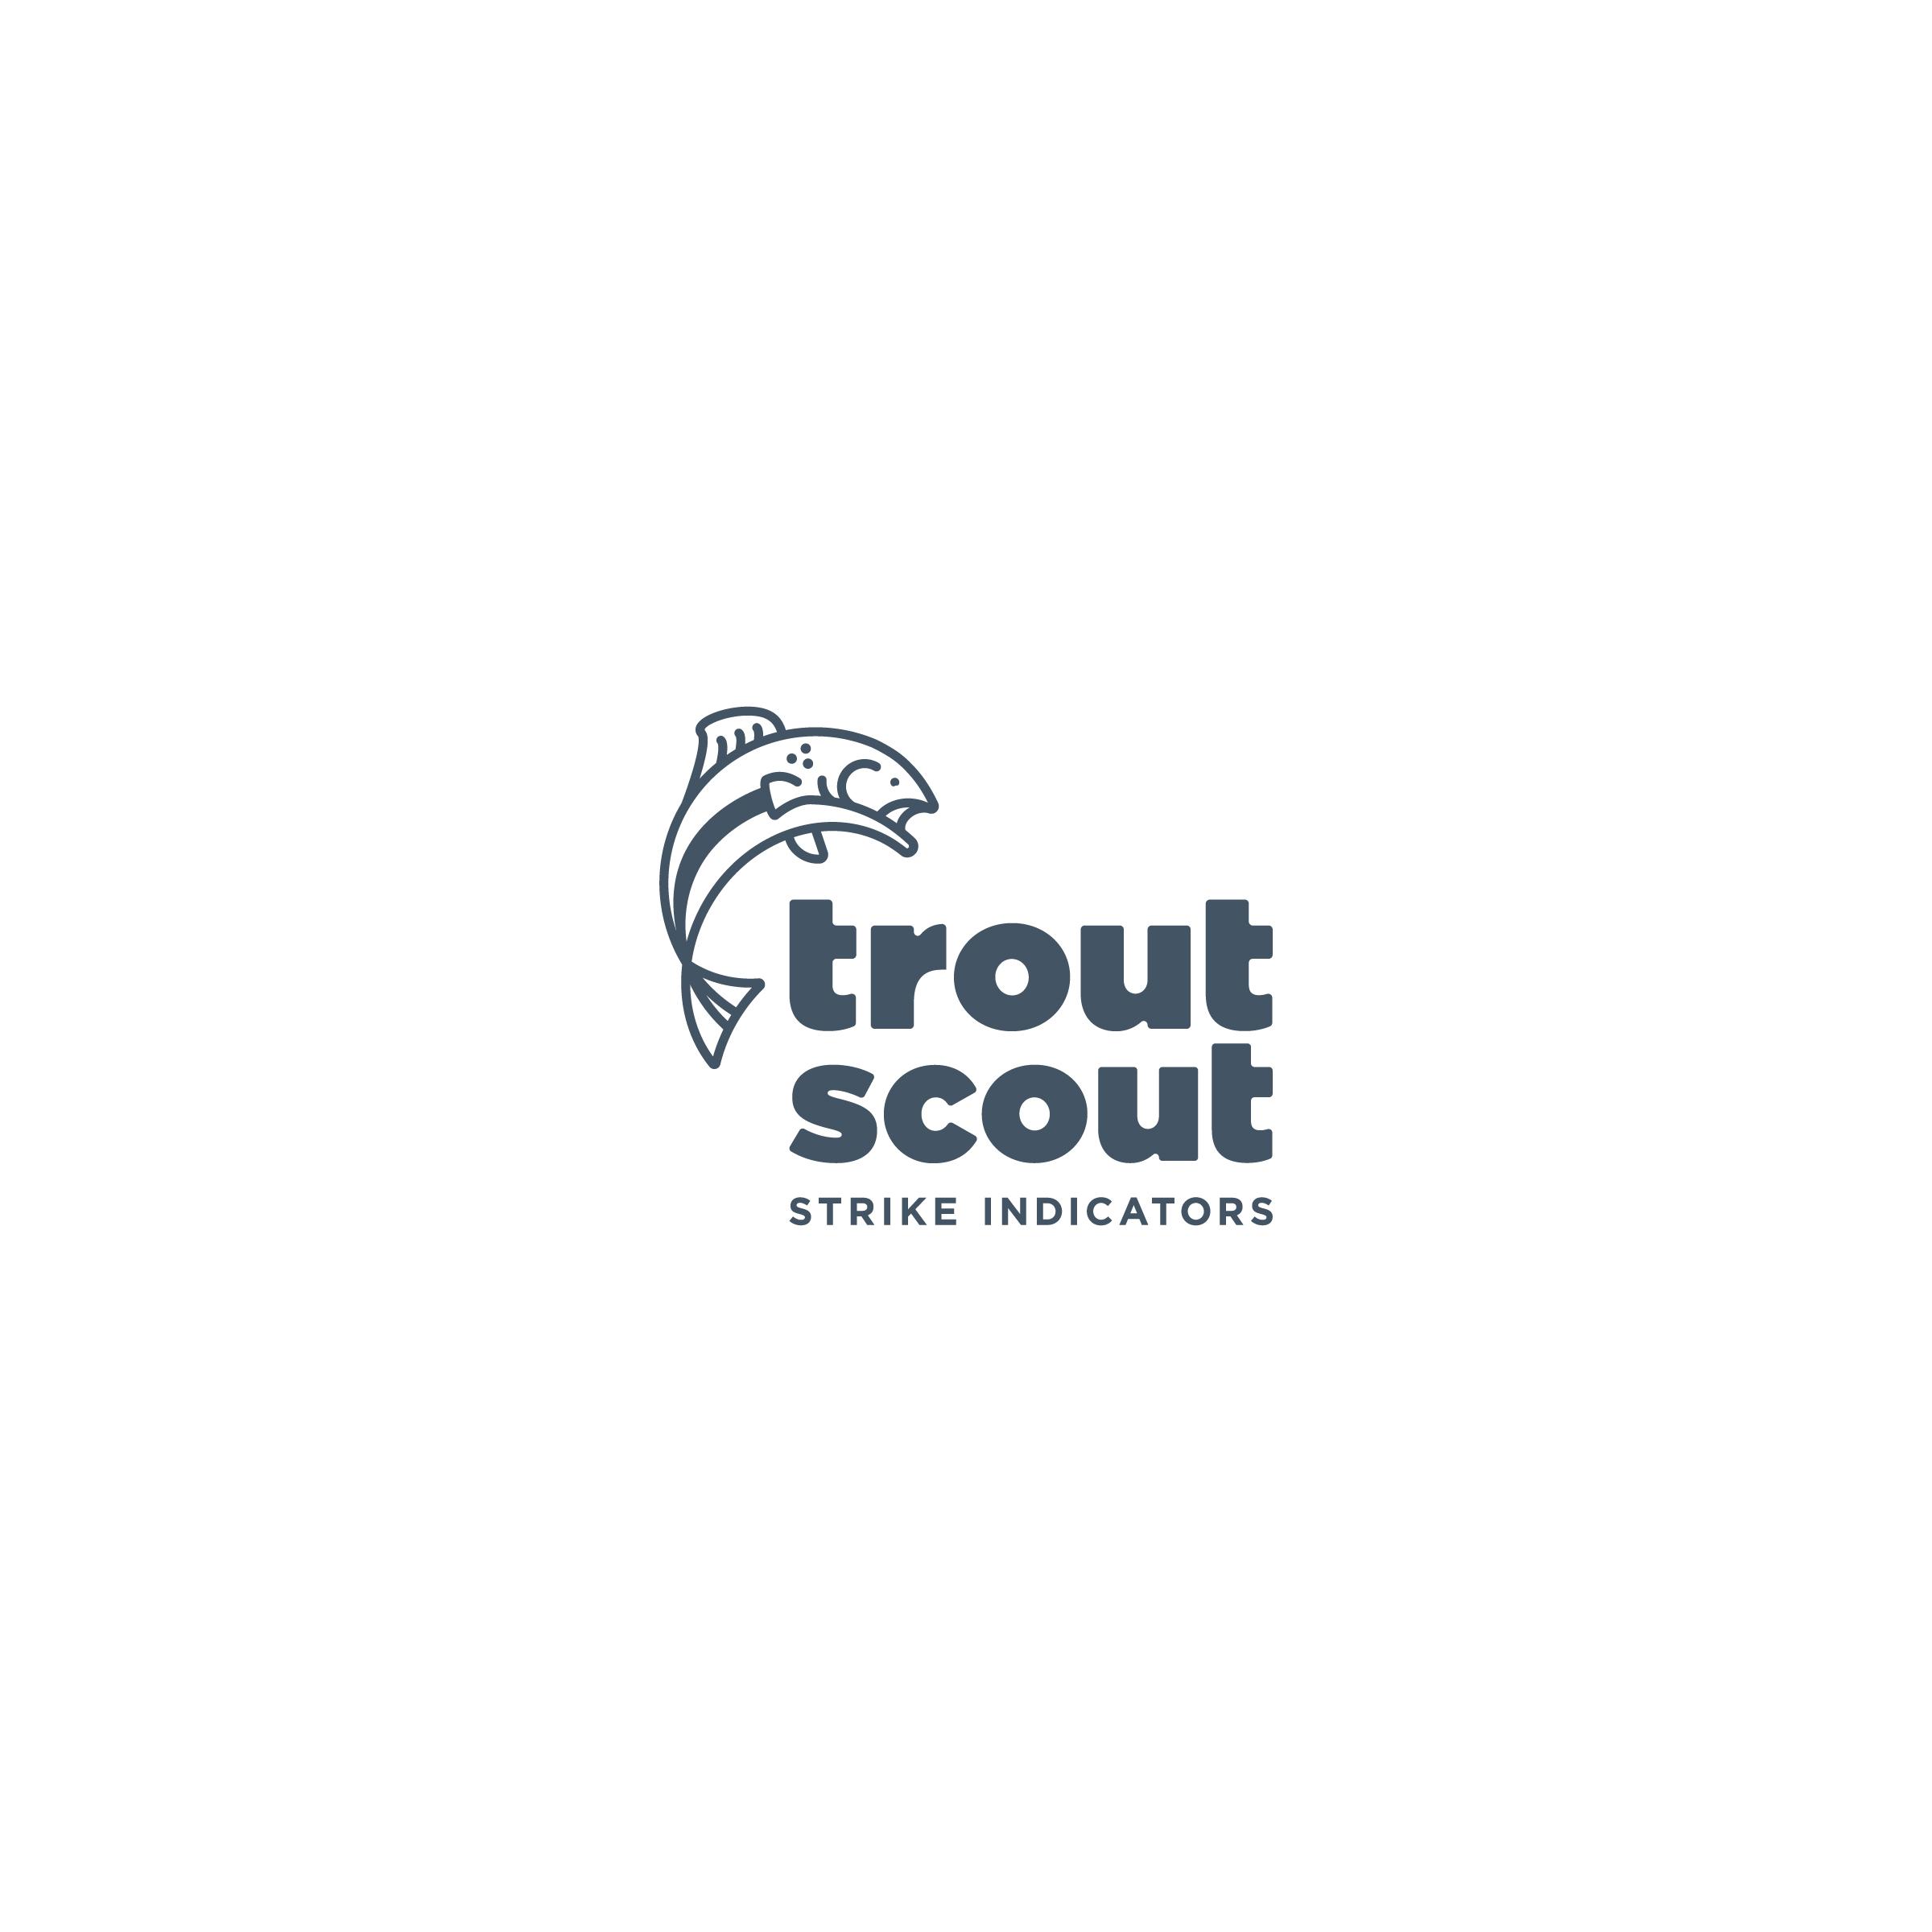 TroutScout_DkBlue_Vrt.jpg